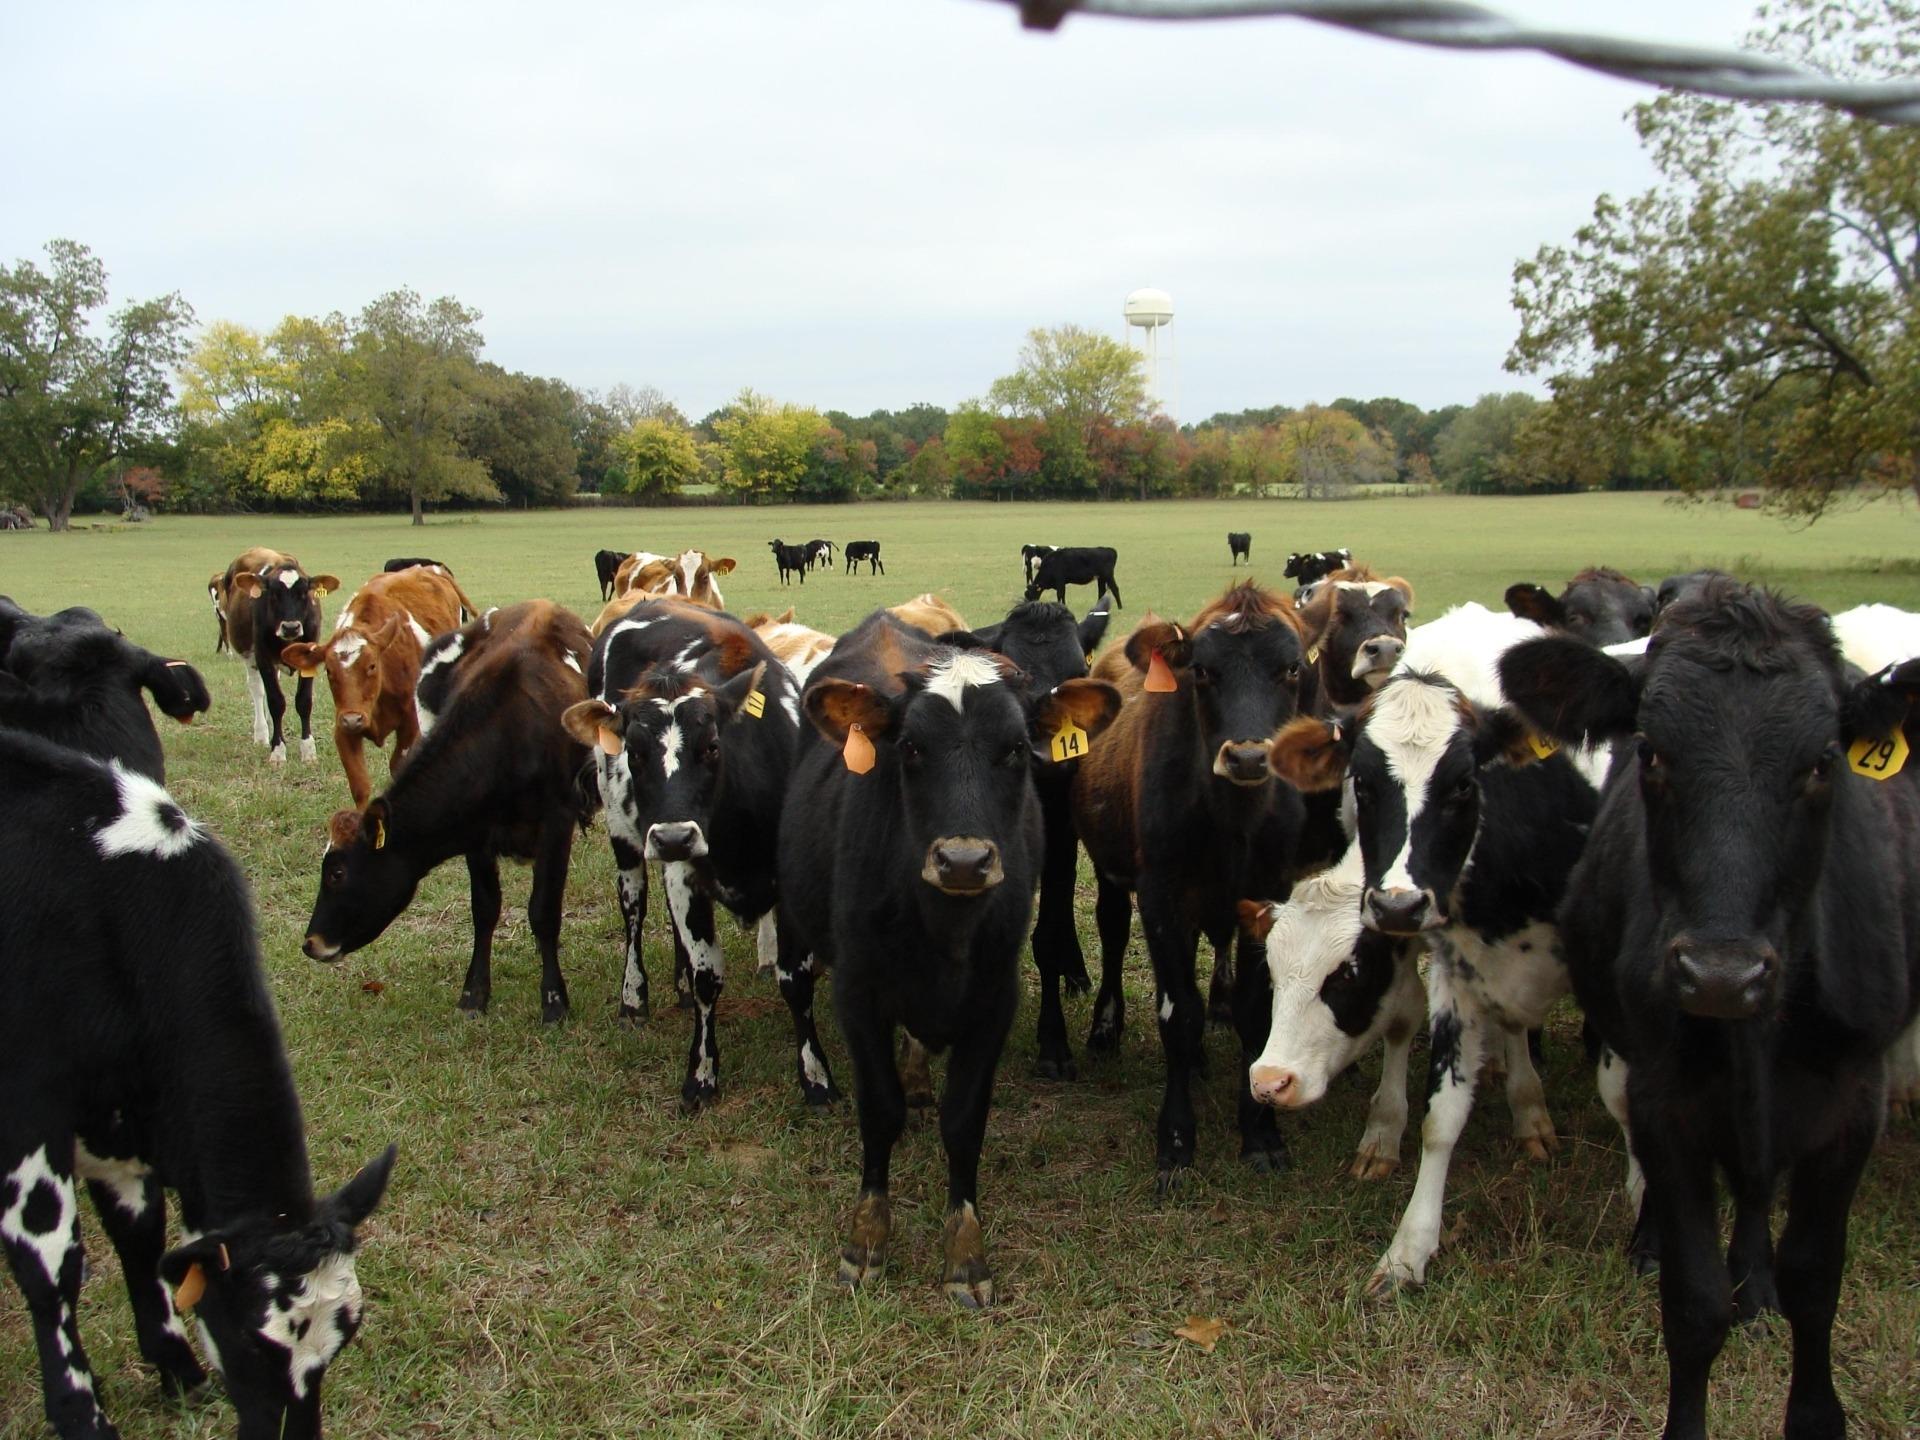 Cow Manure Makes Great Free Fertilizer